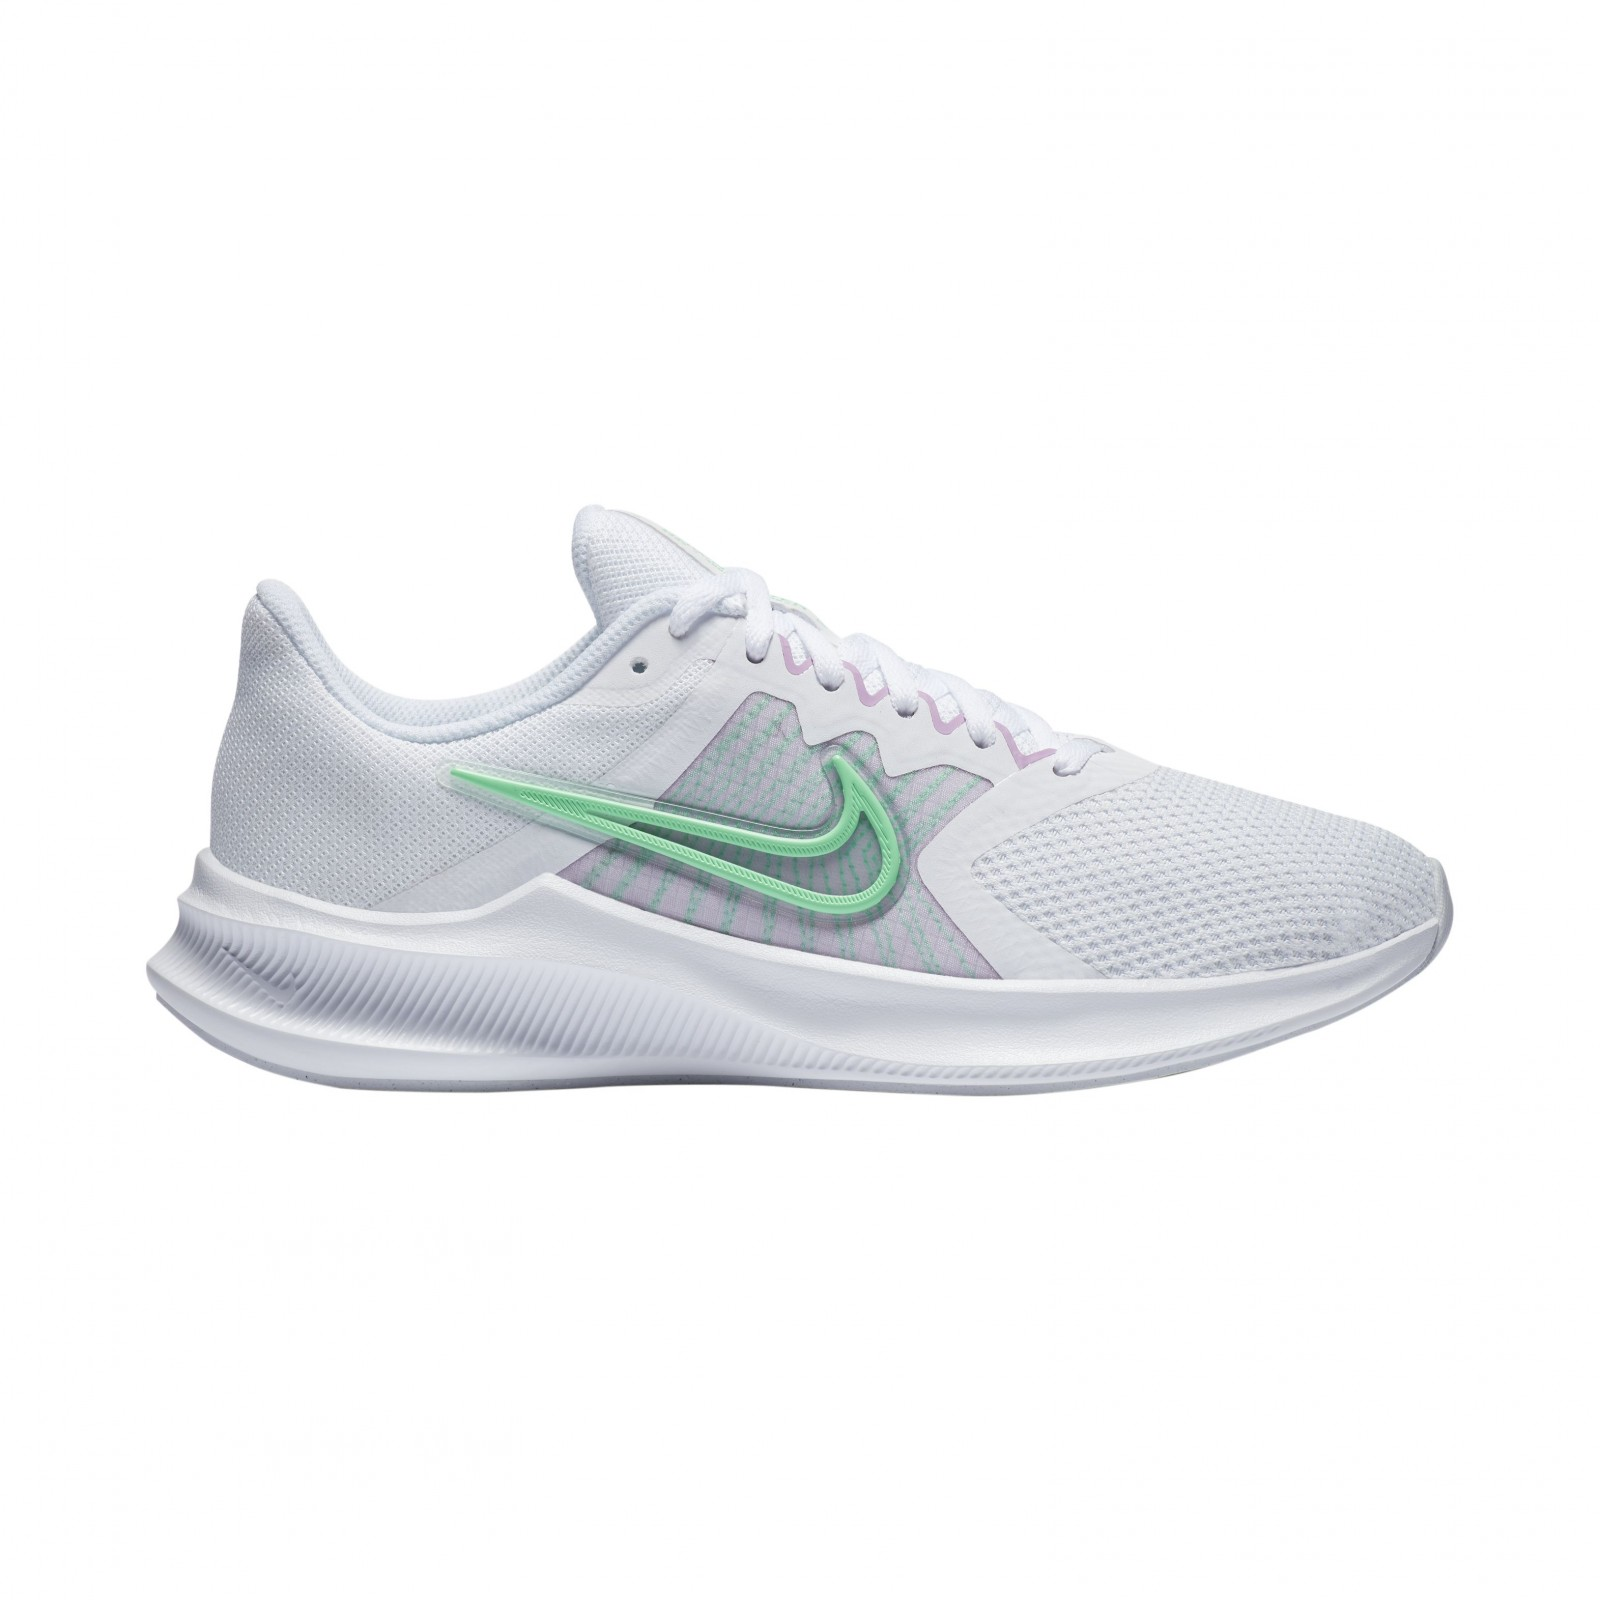 Nike Downshifter 11 WHITE/GREEN GLOW-INFINITE LILAC